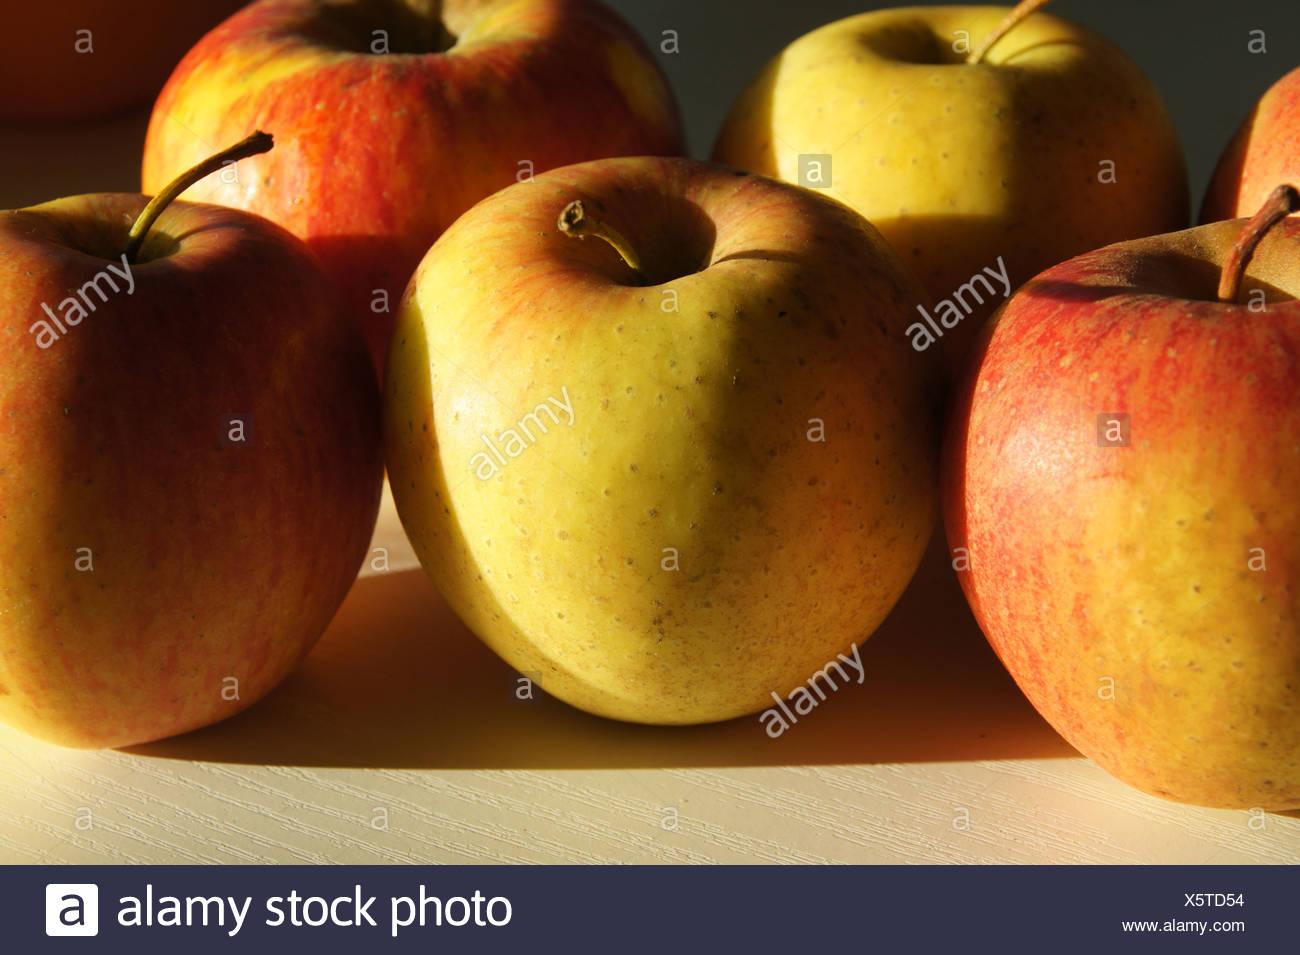 Apple-Sort Pinova - Stock Image